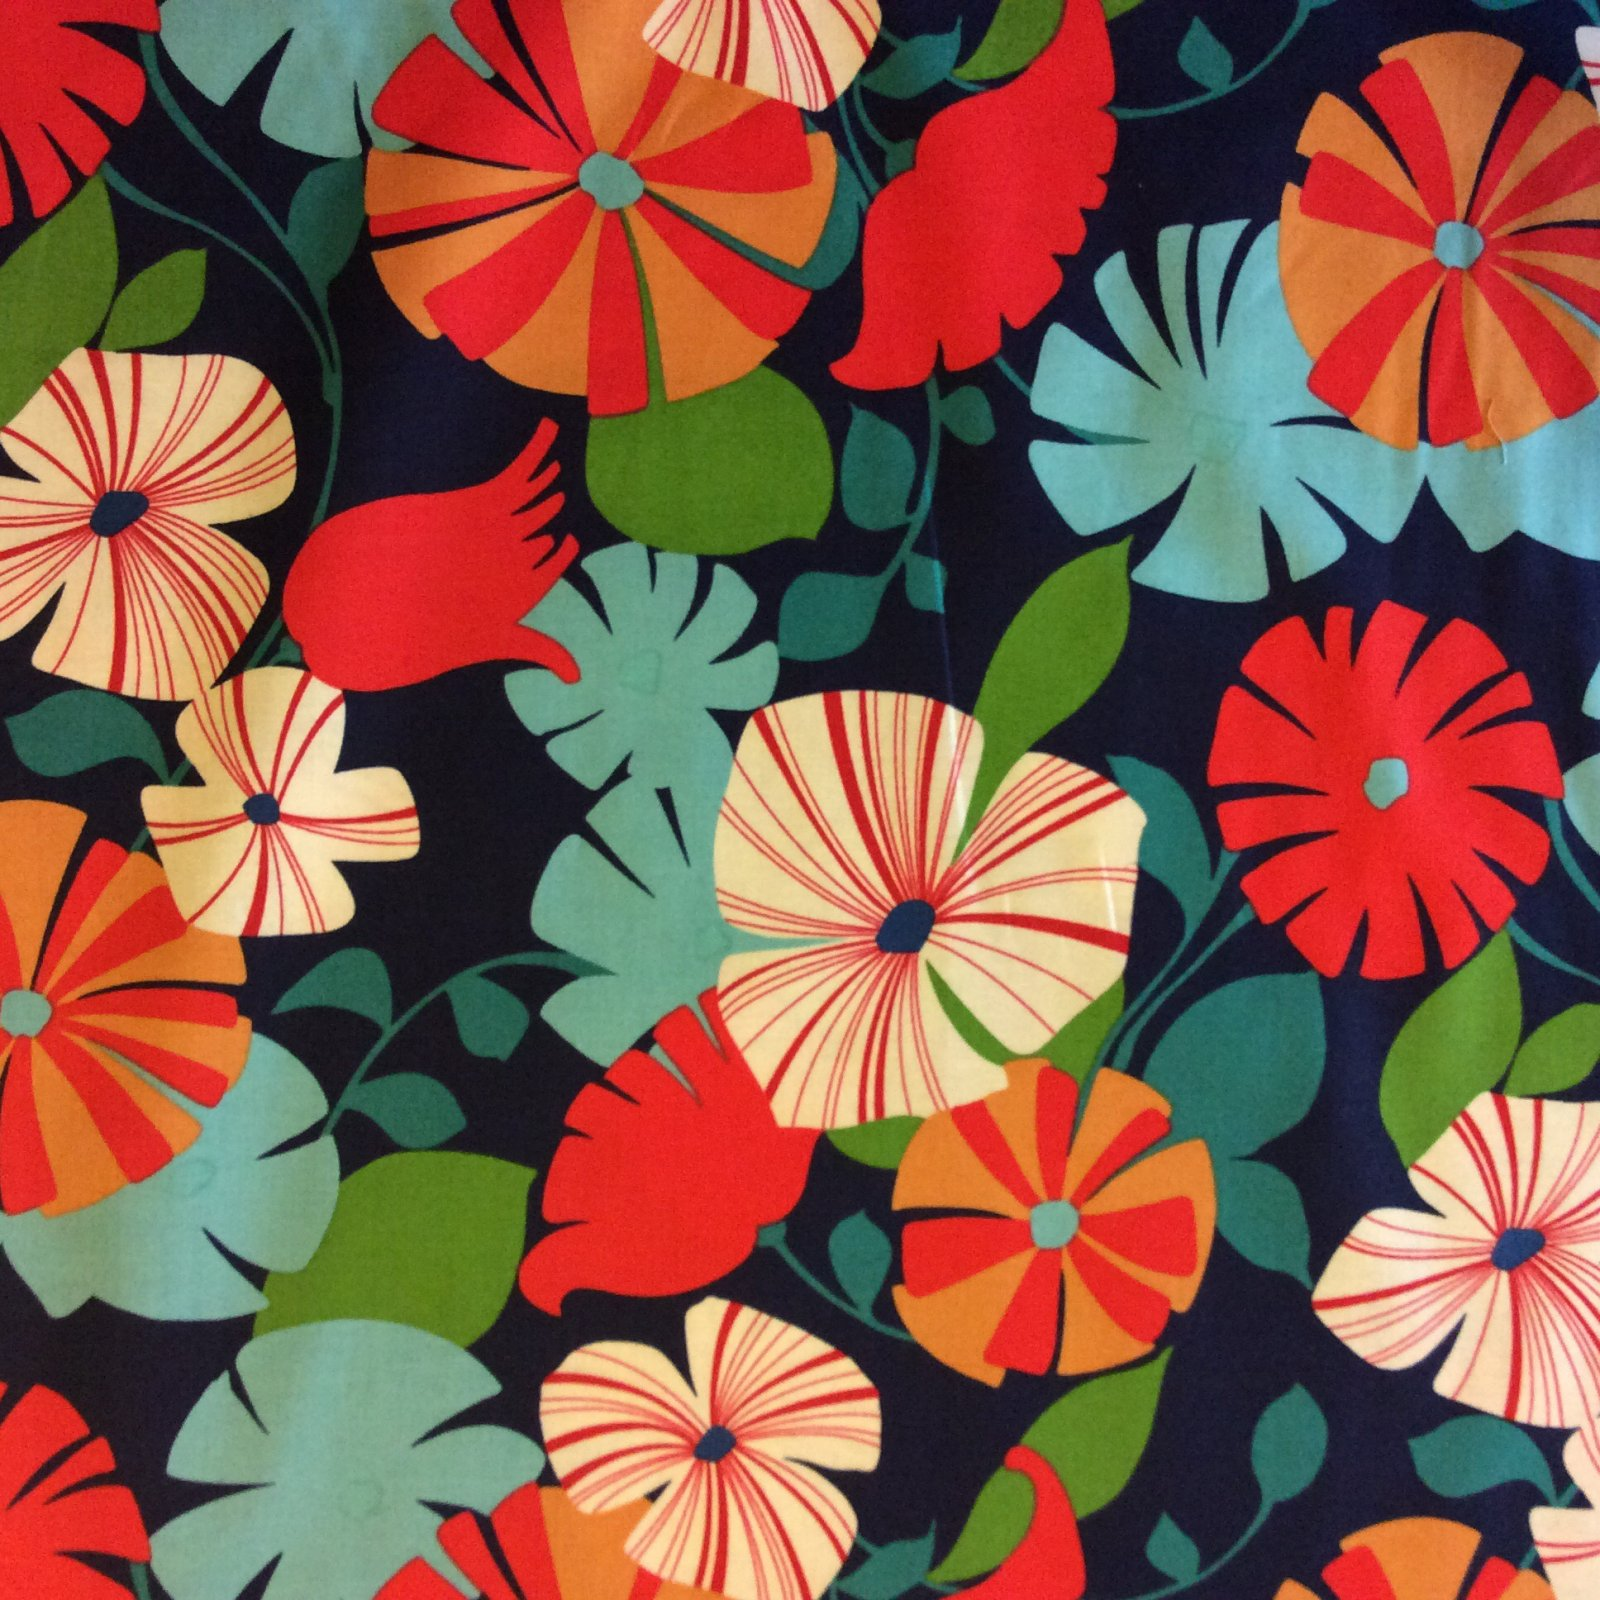 Hawaiian Floral Cotton Quilt Fabric AH174